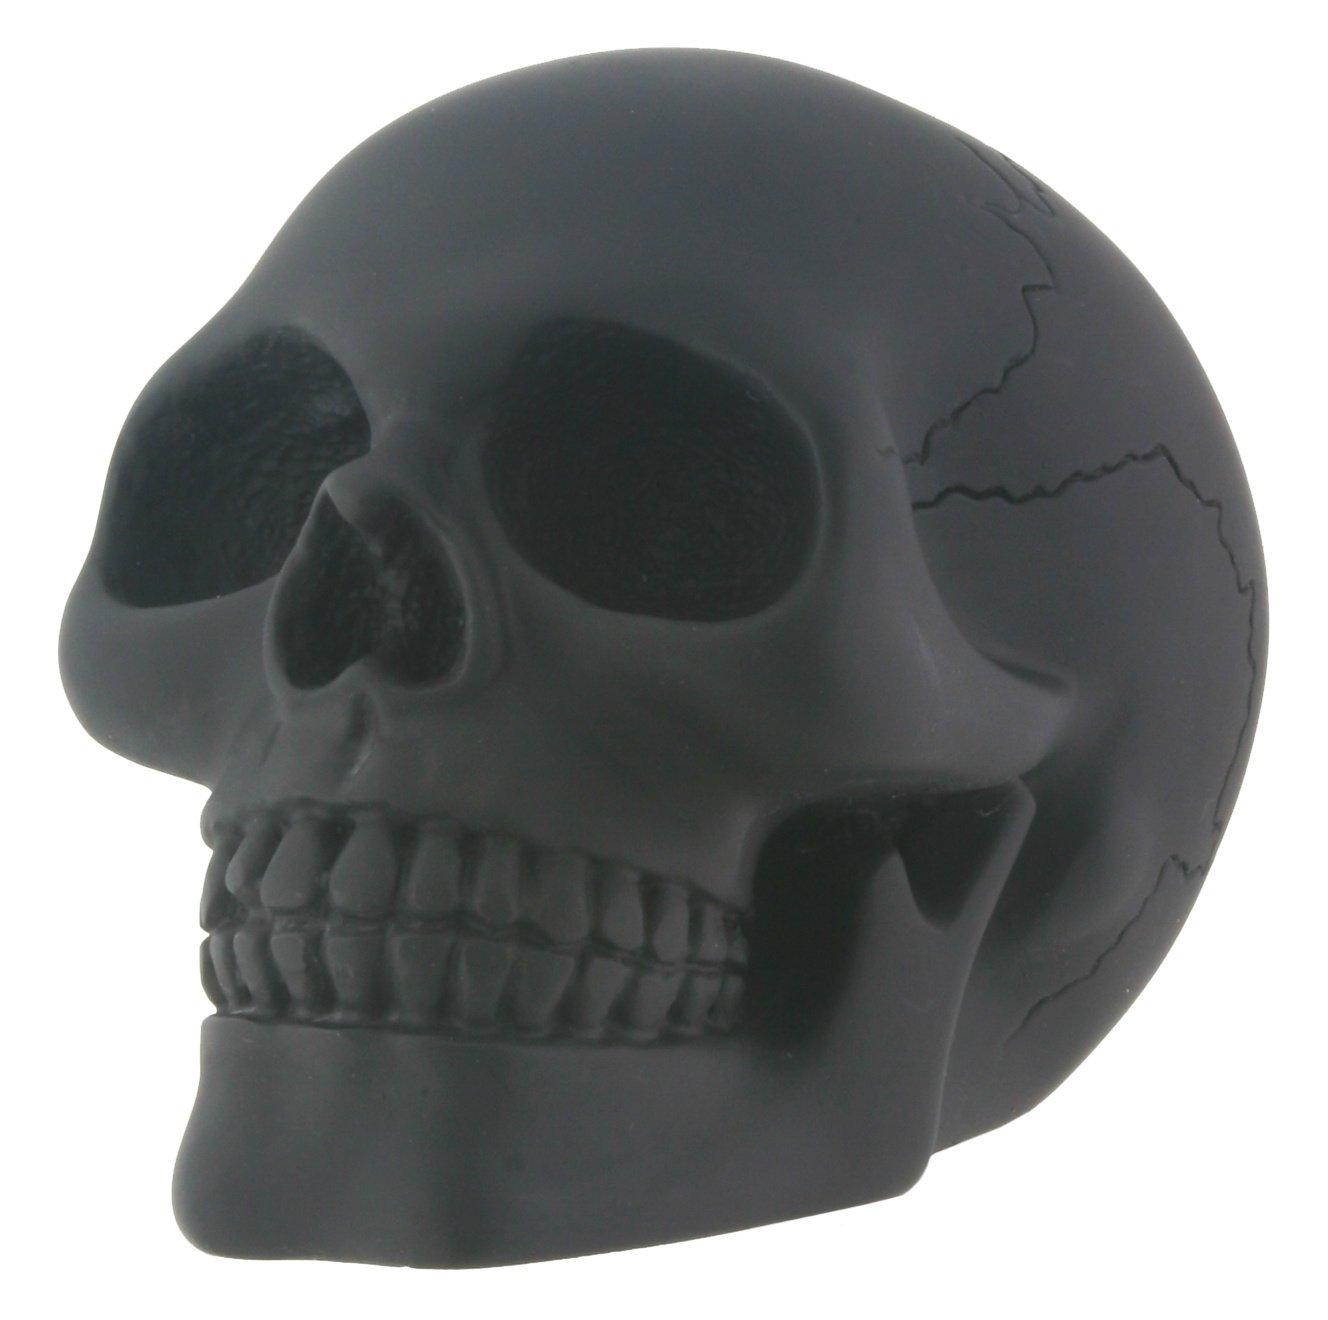 Black Skull Head Collectible Skeleton Decoration Figurine